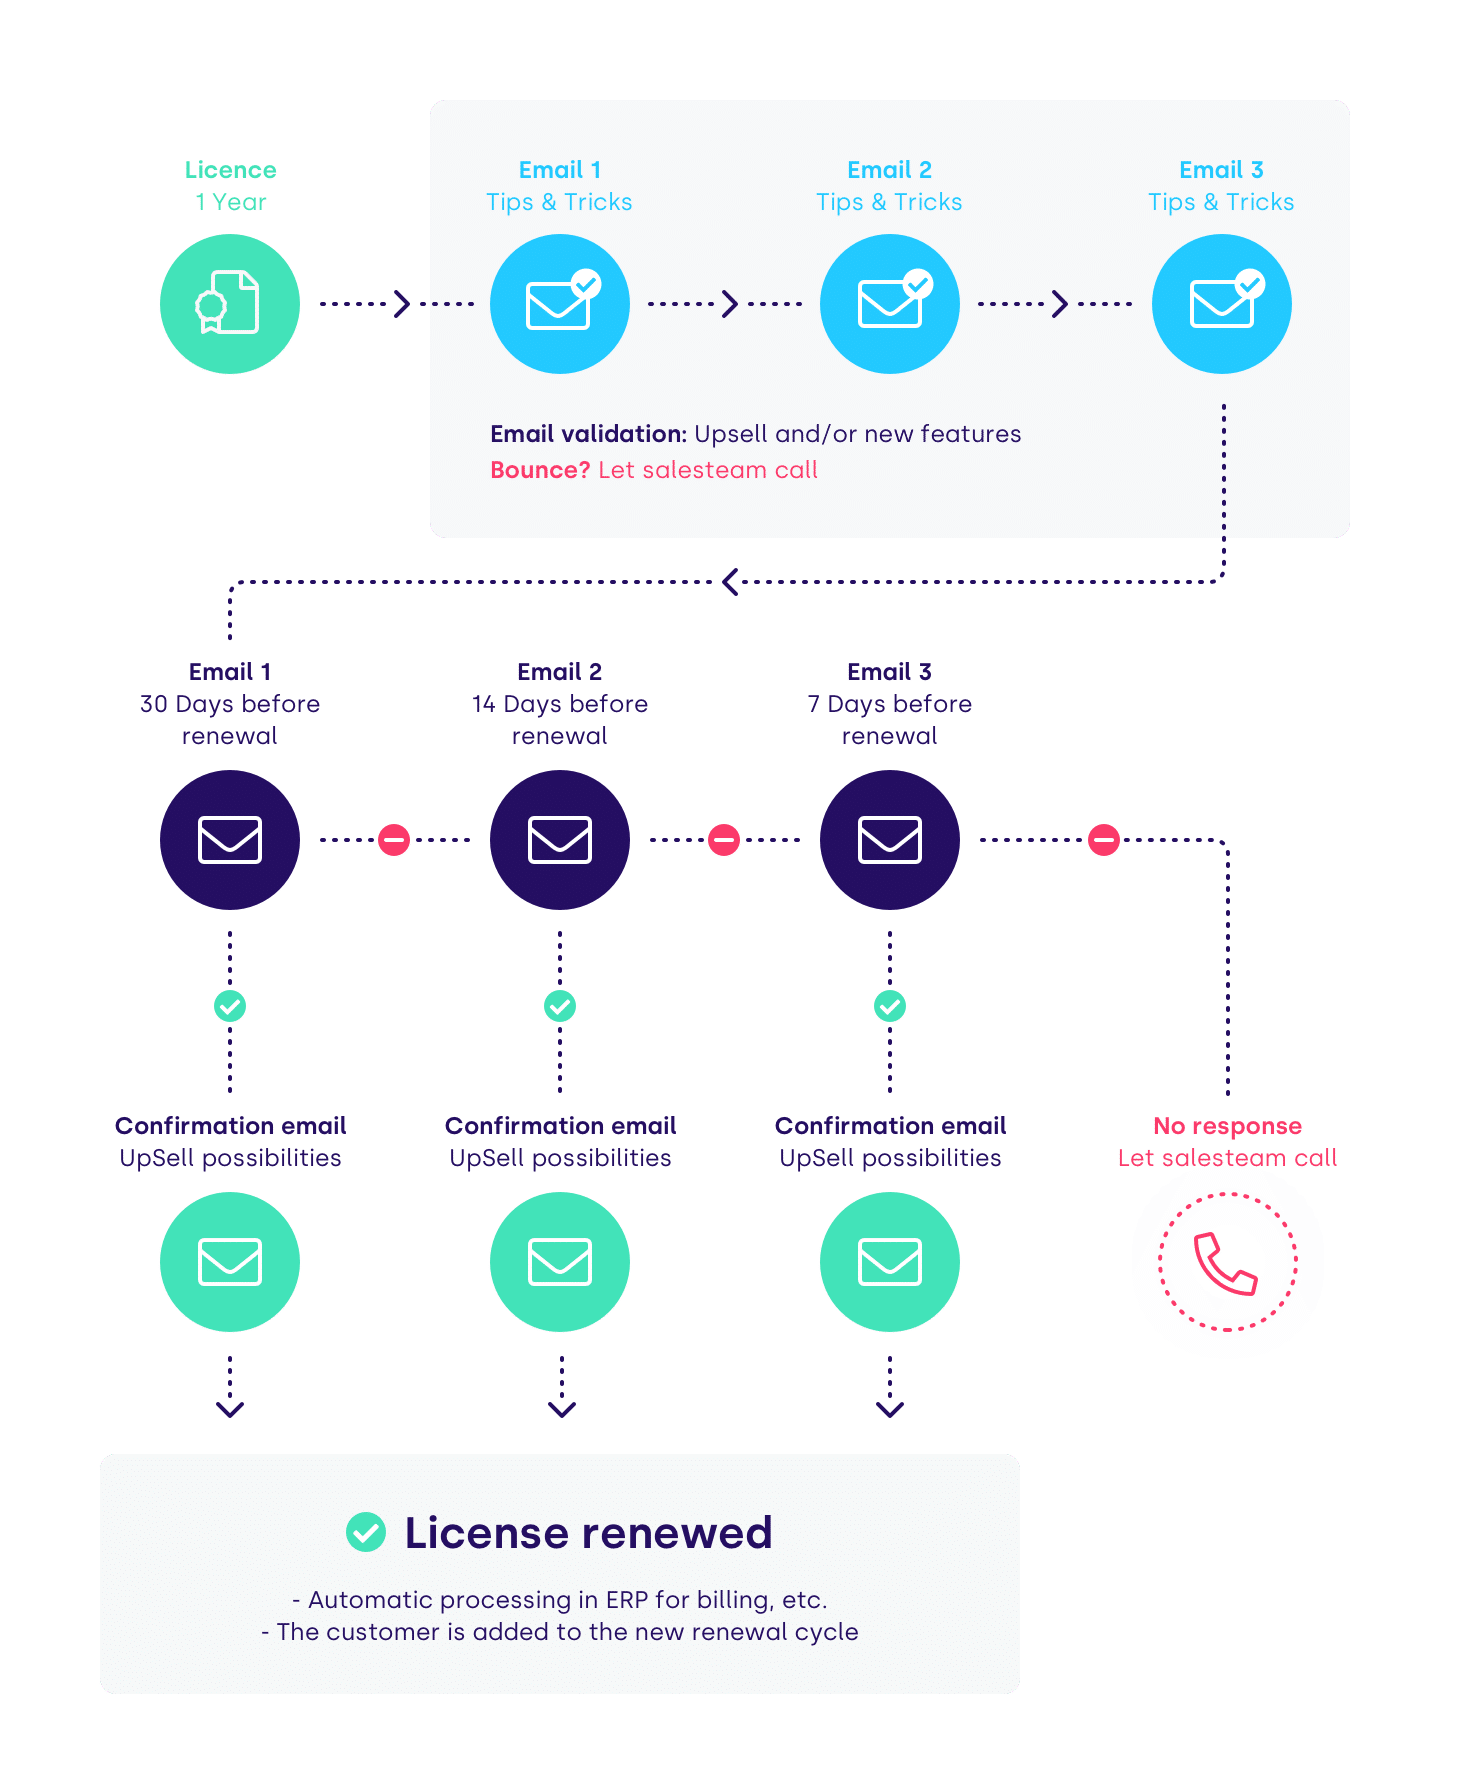 license renewal email flow